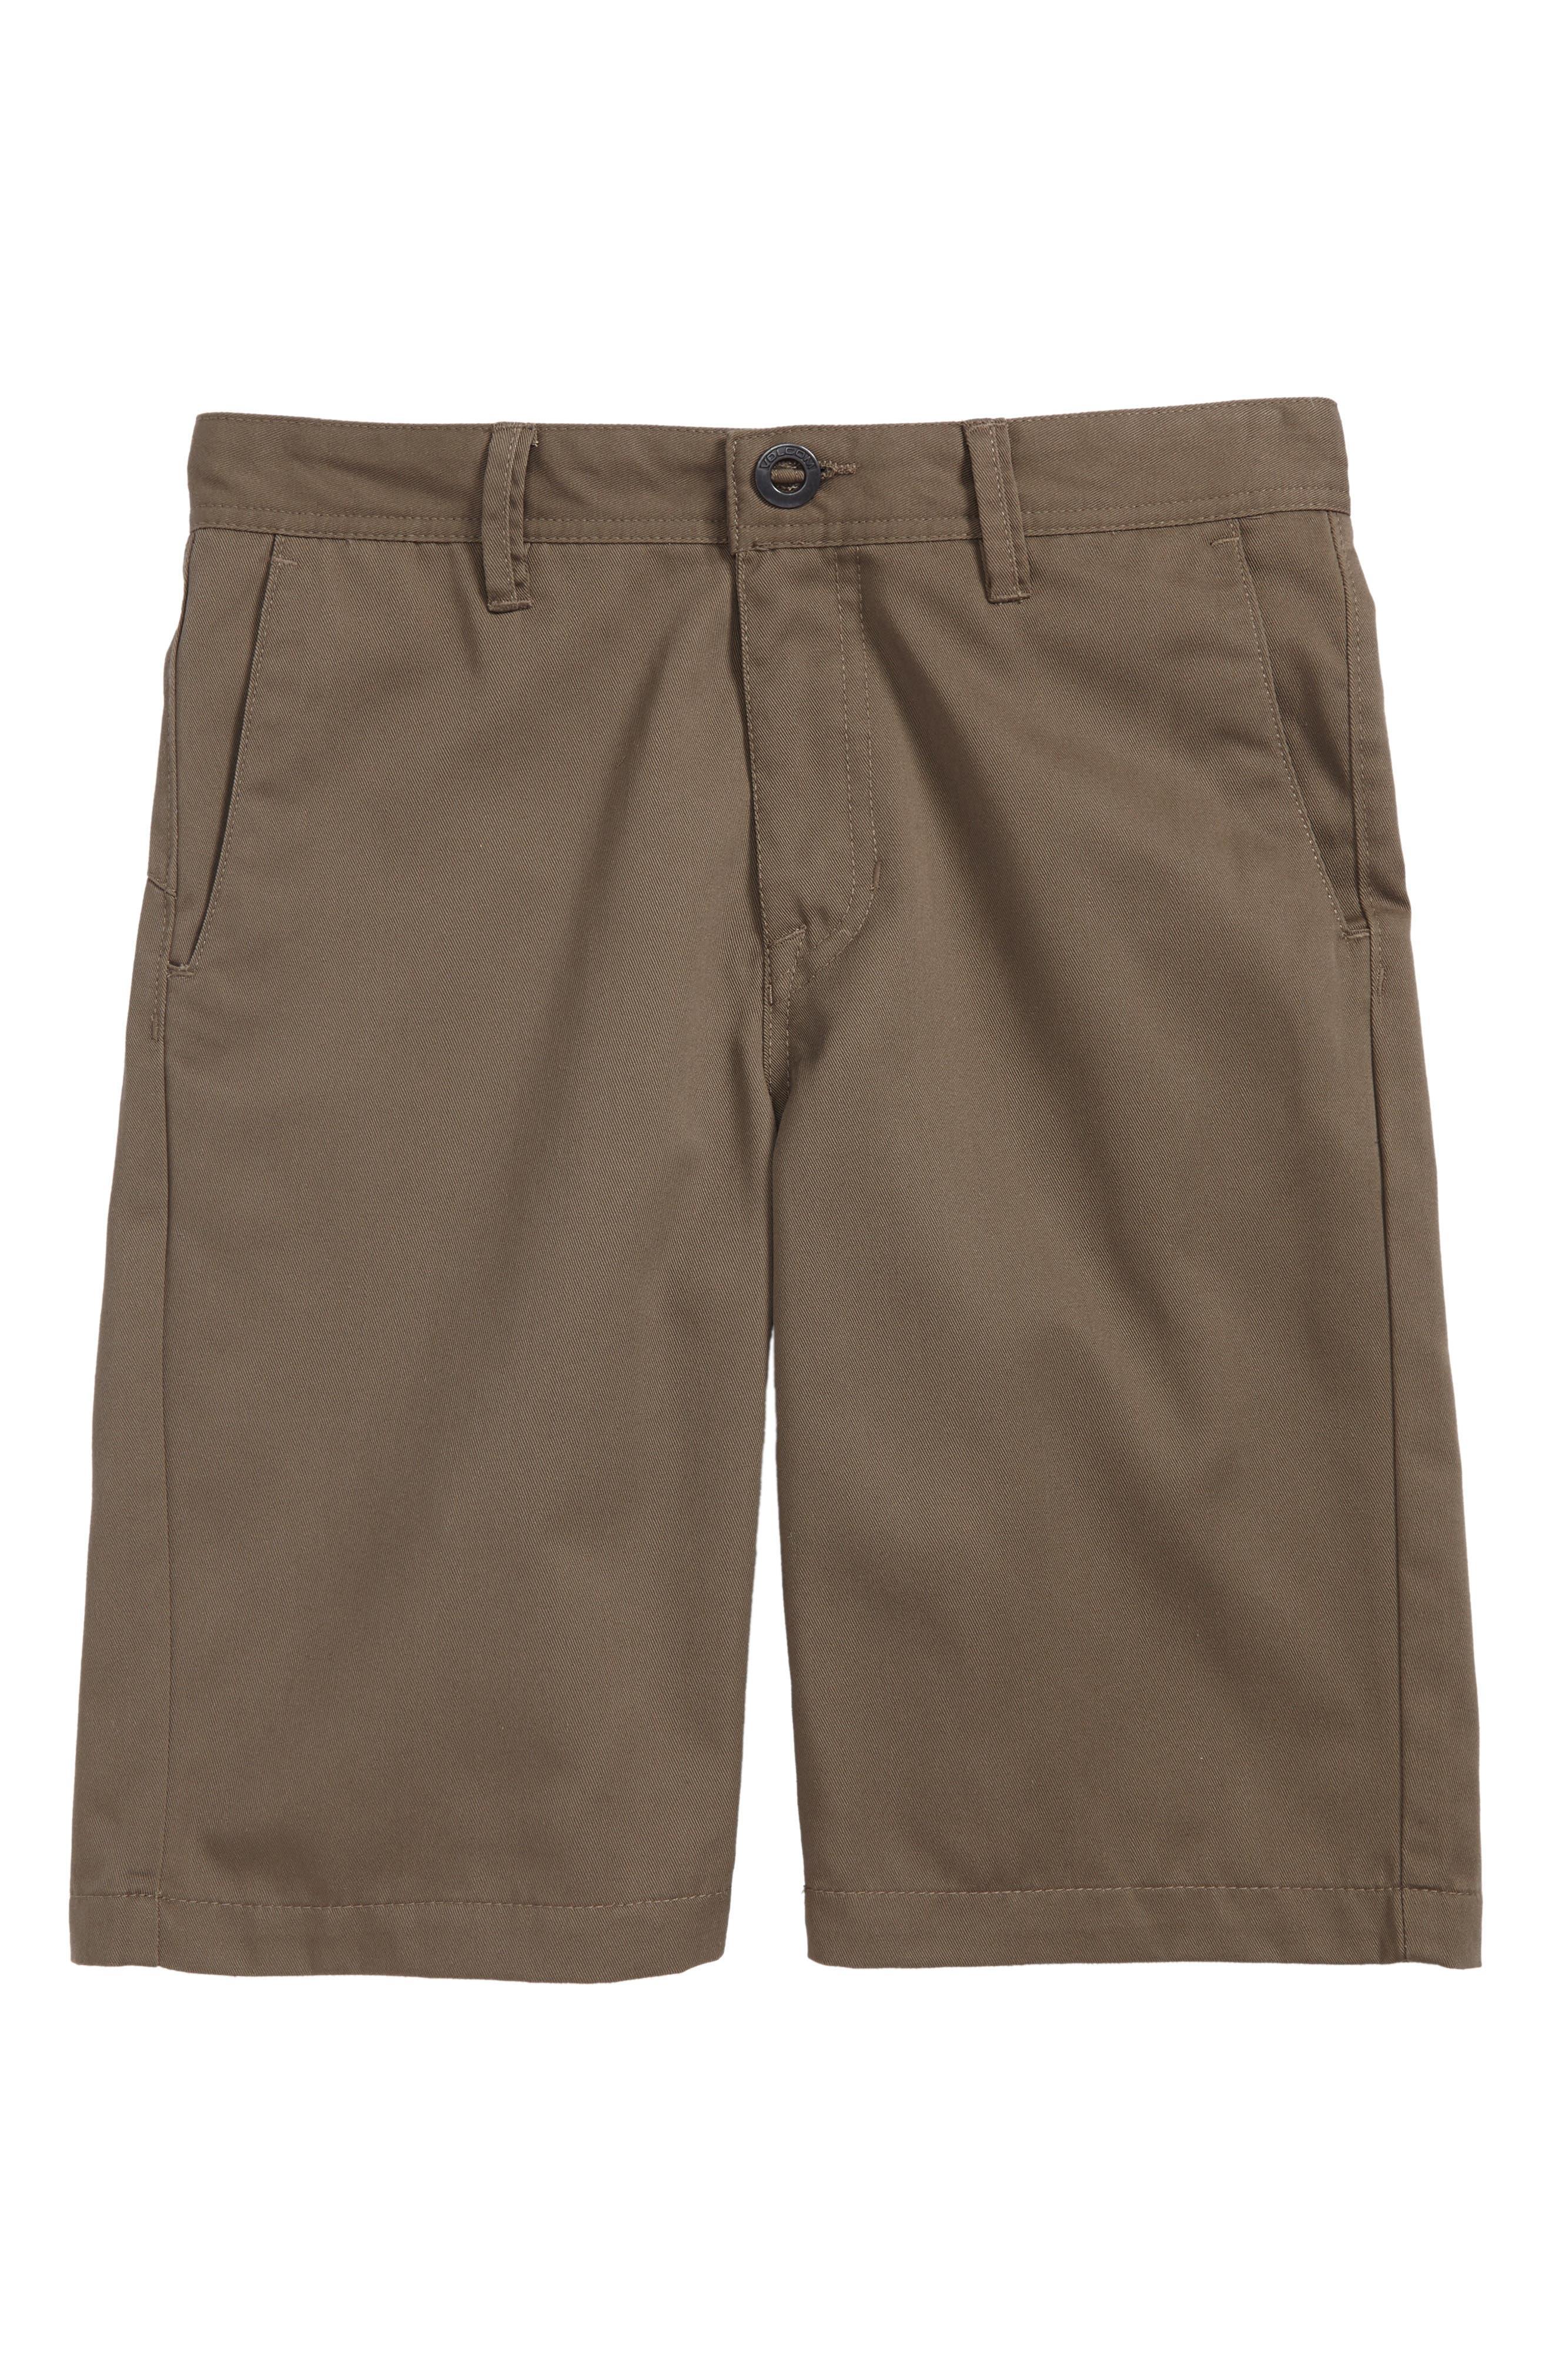 Alternate Image 1 Selected - Volcom Chino Shorts (Big Boys)